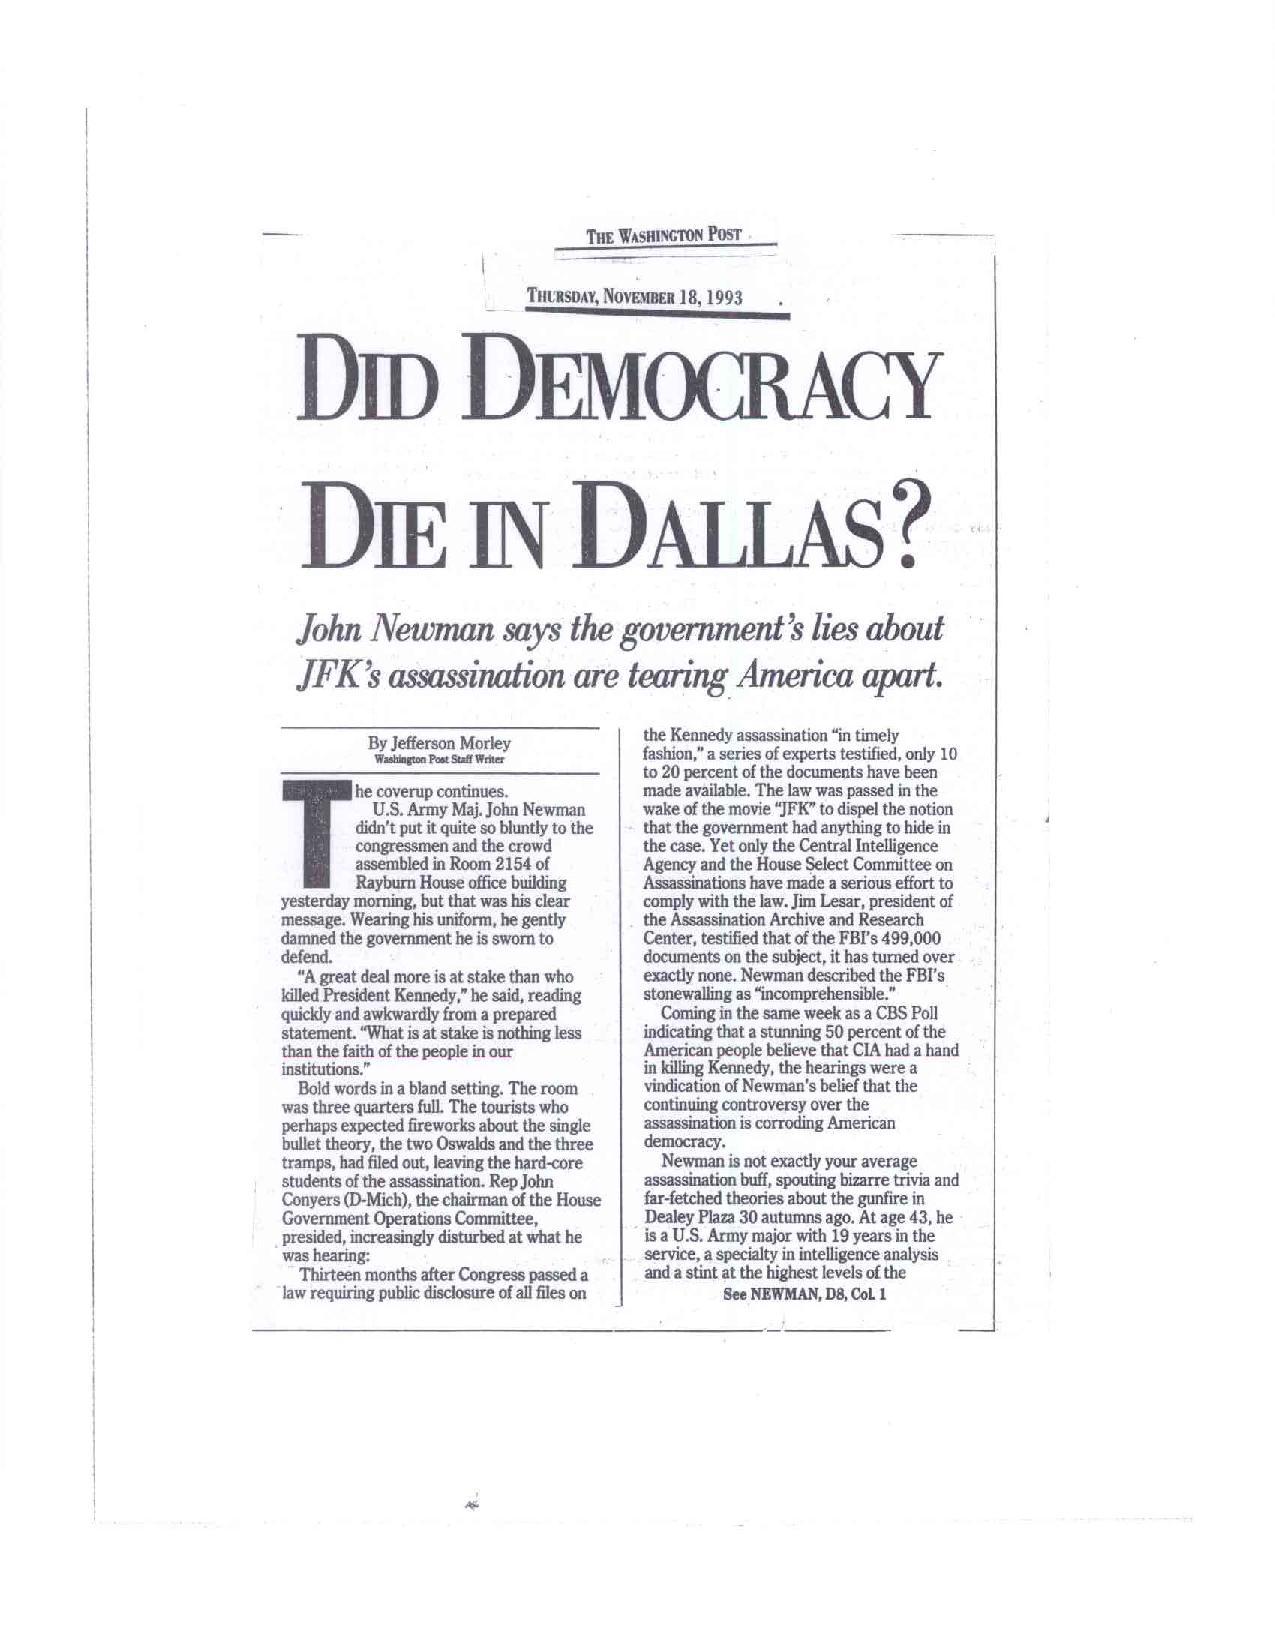 DIDDEMOCRACYDIEINDALLAS-1 Did Dem Die in Dallas?